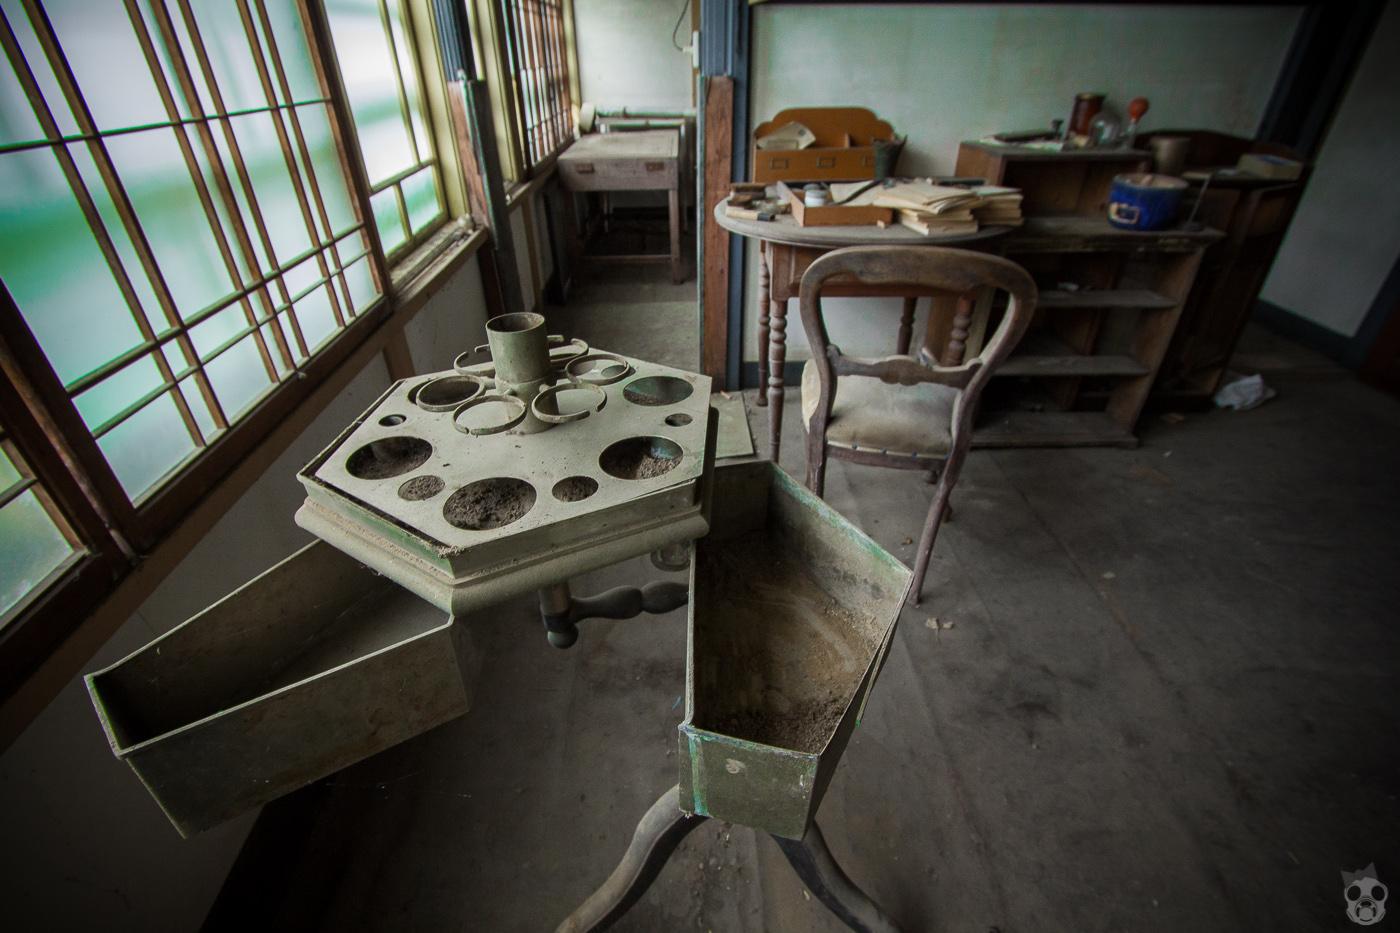 The Oldest Abandoned Hospital Wow! Z-hospital | Z医院